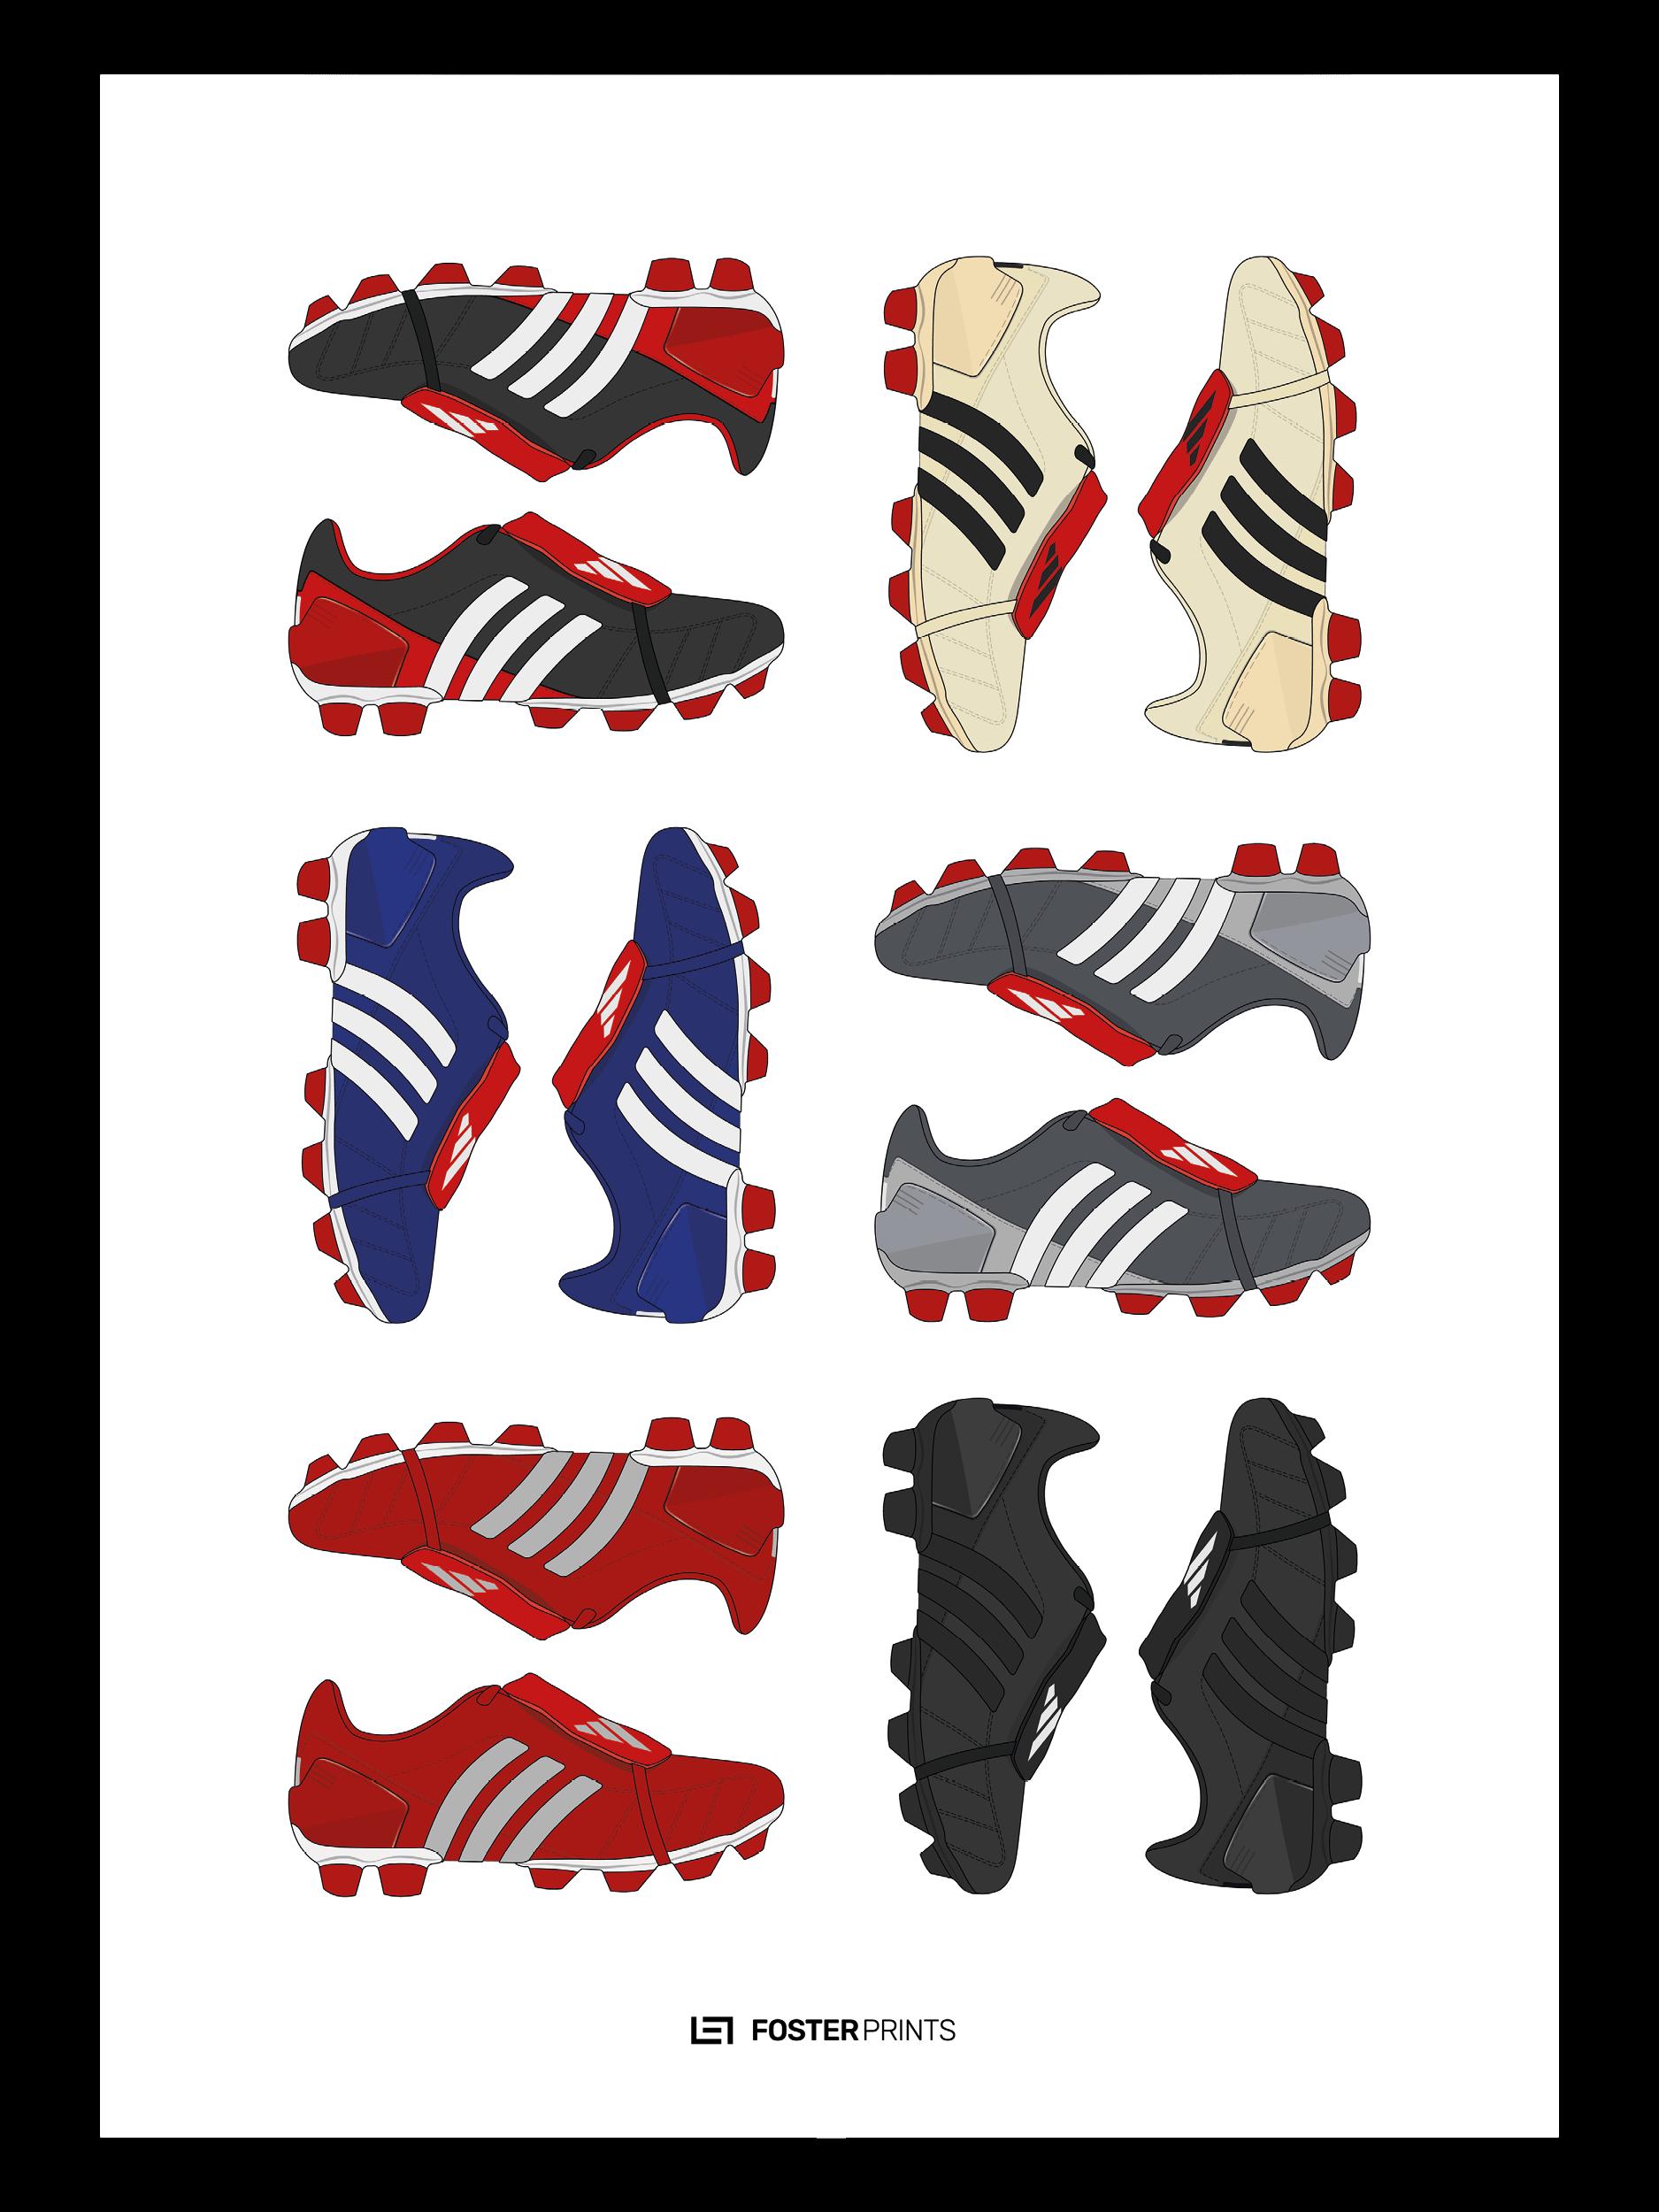 Nike Football Shoes Socks bristolscooters.co.uk